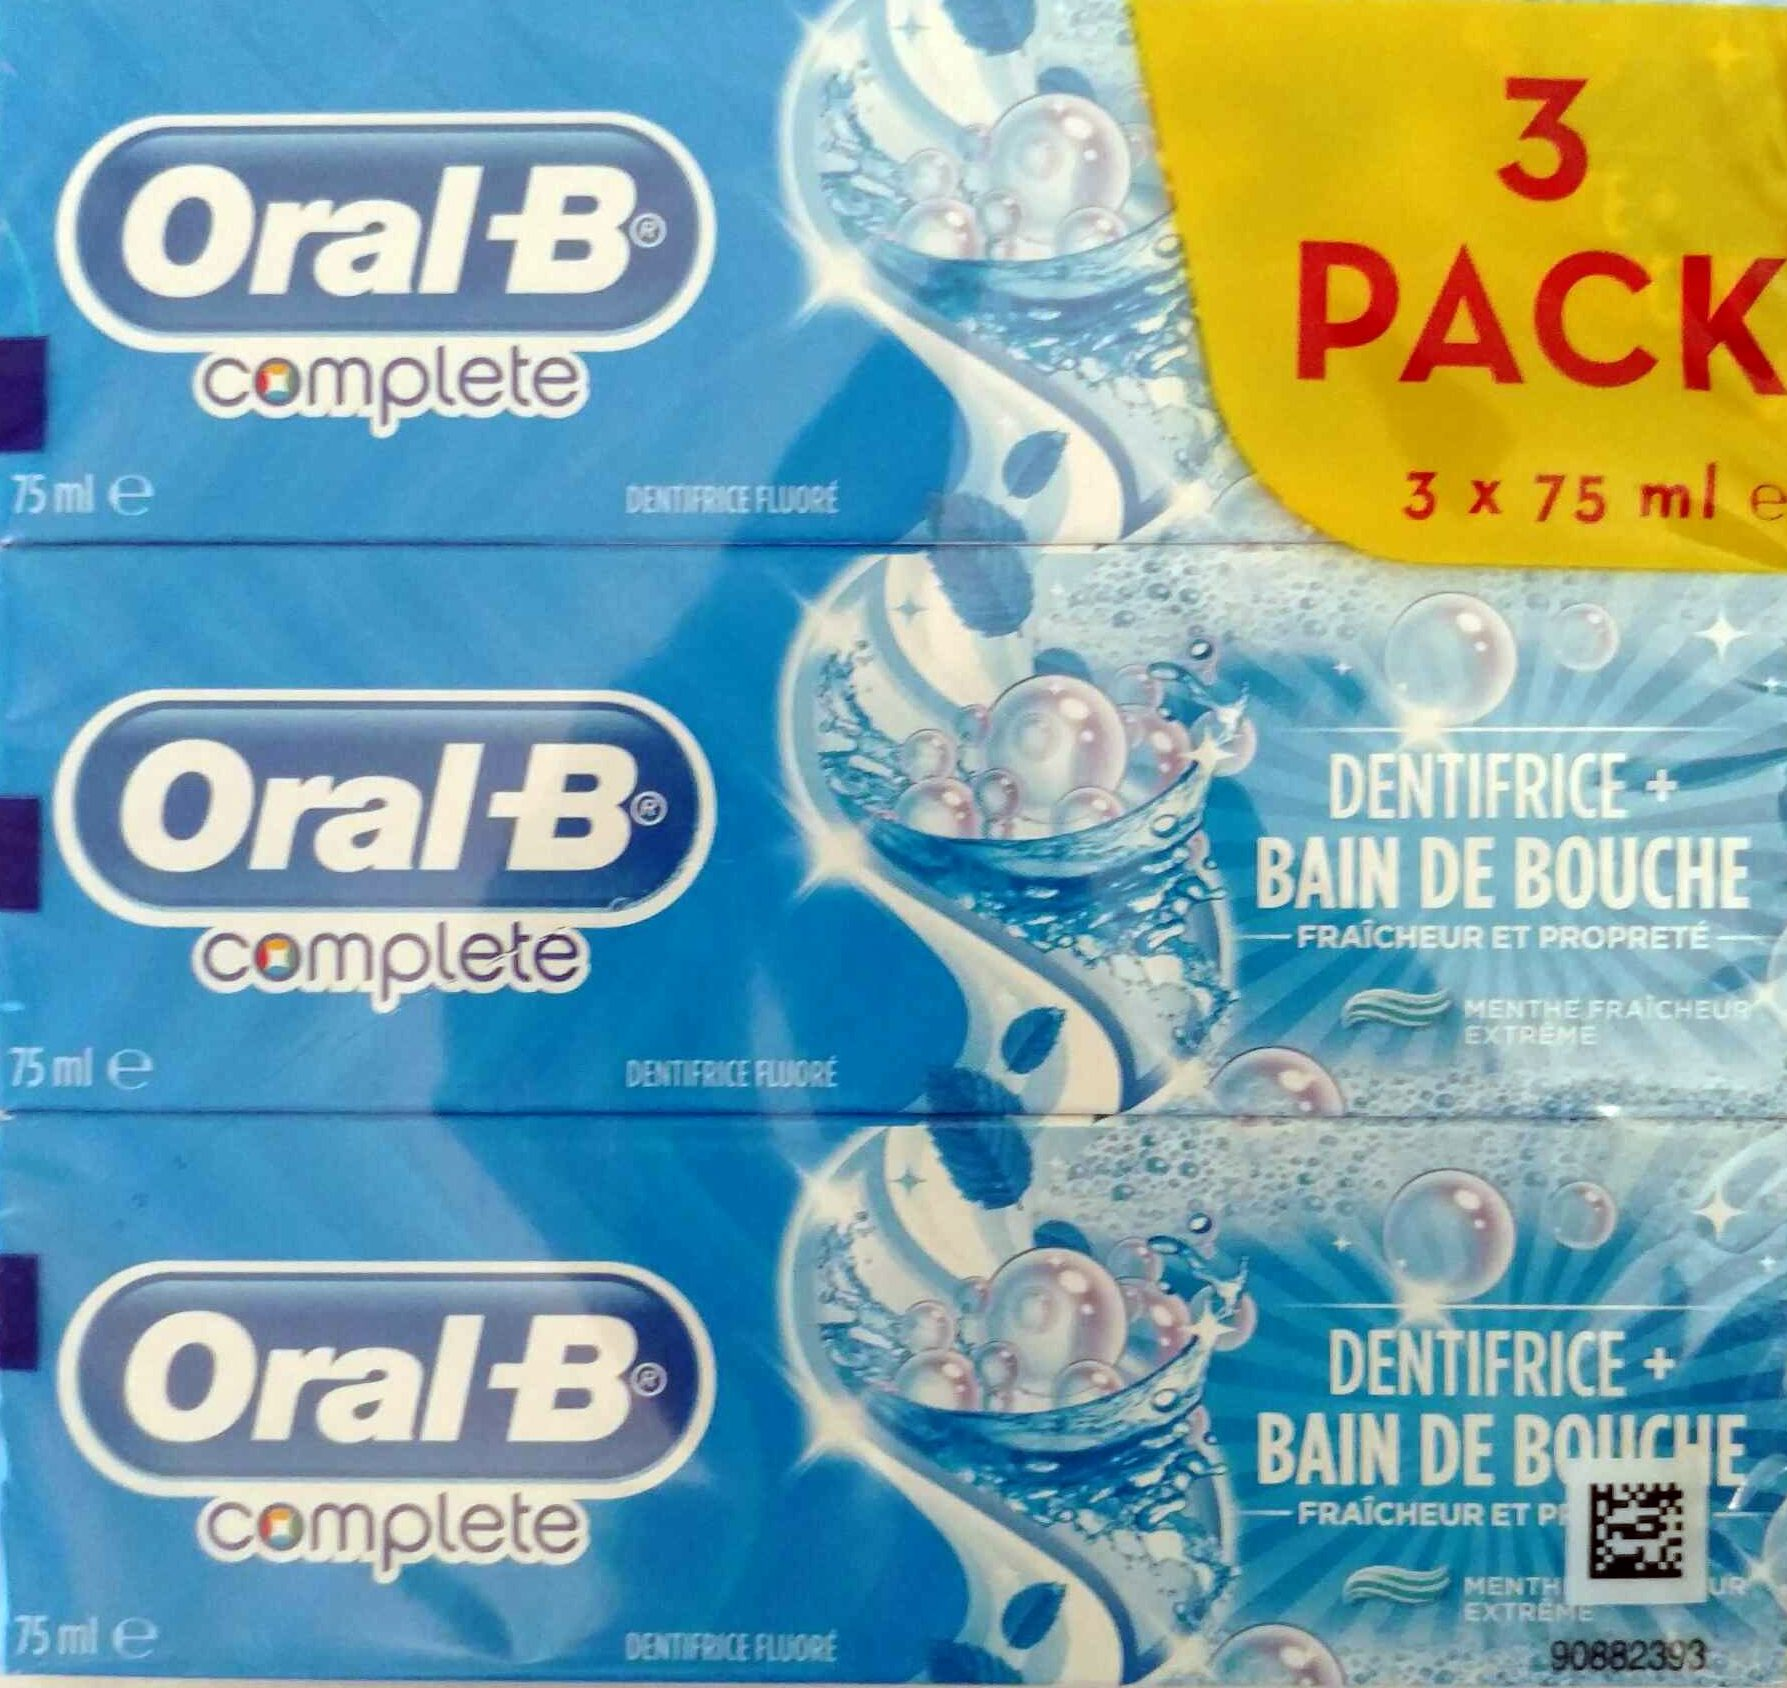 Complete dentifrice + bain de bouche (3 Pack) - Product - fr